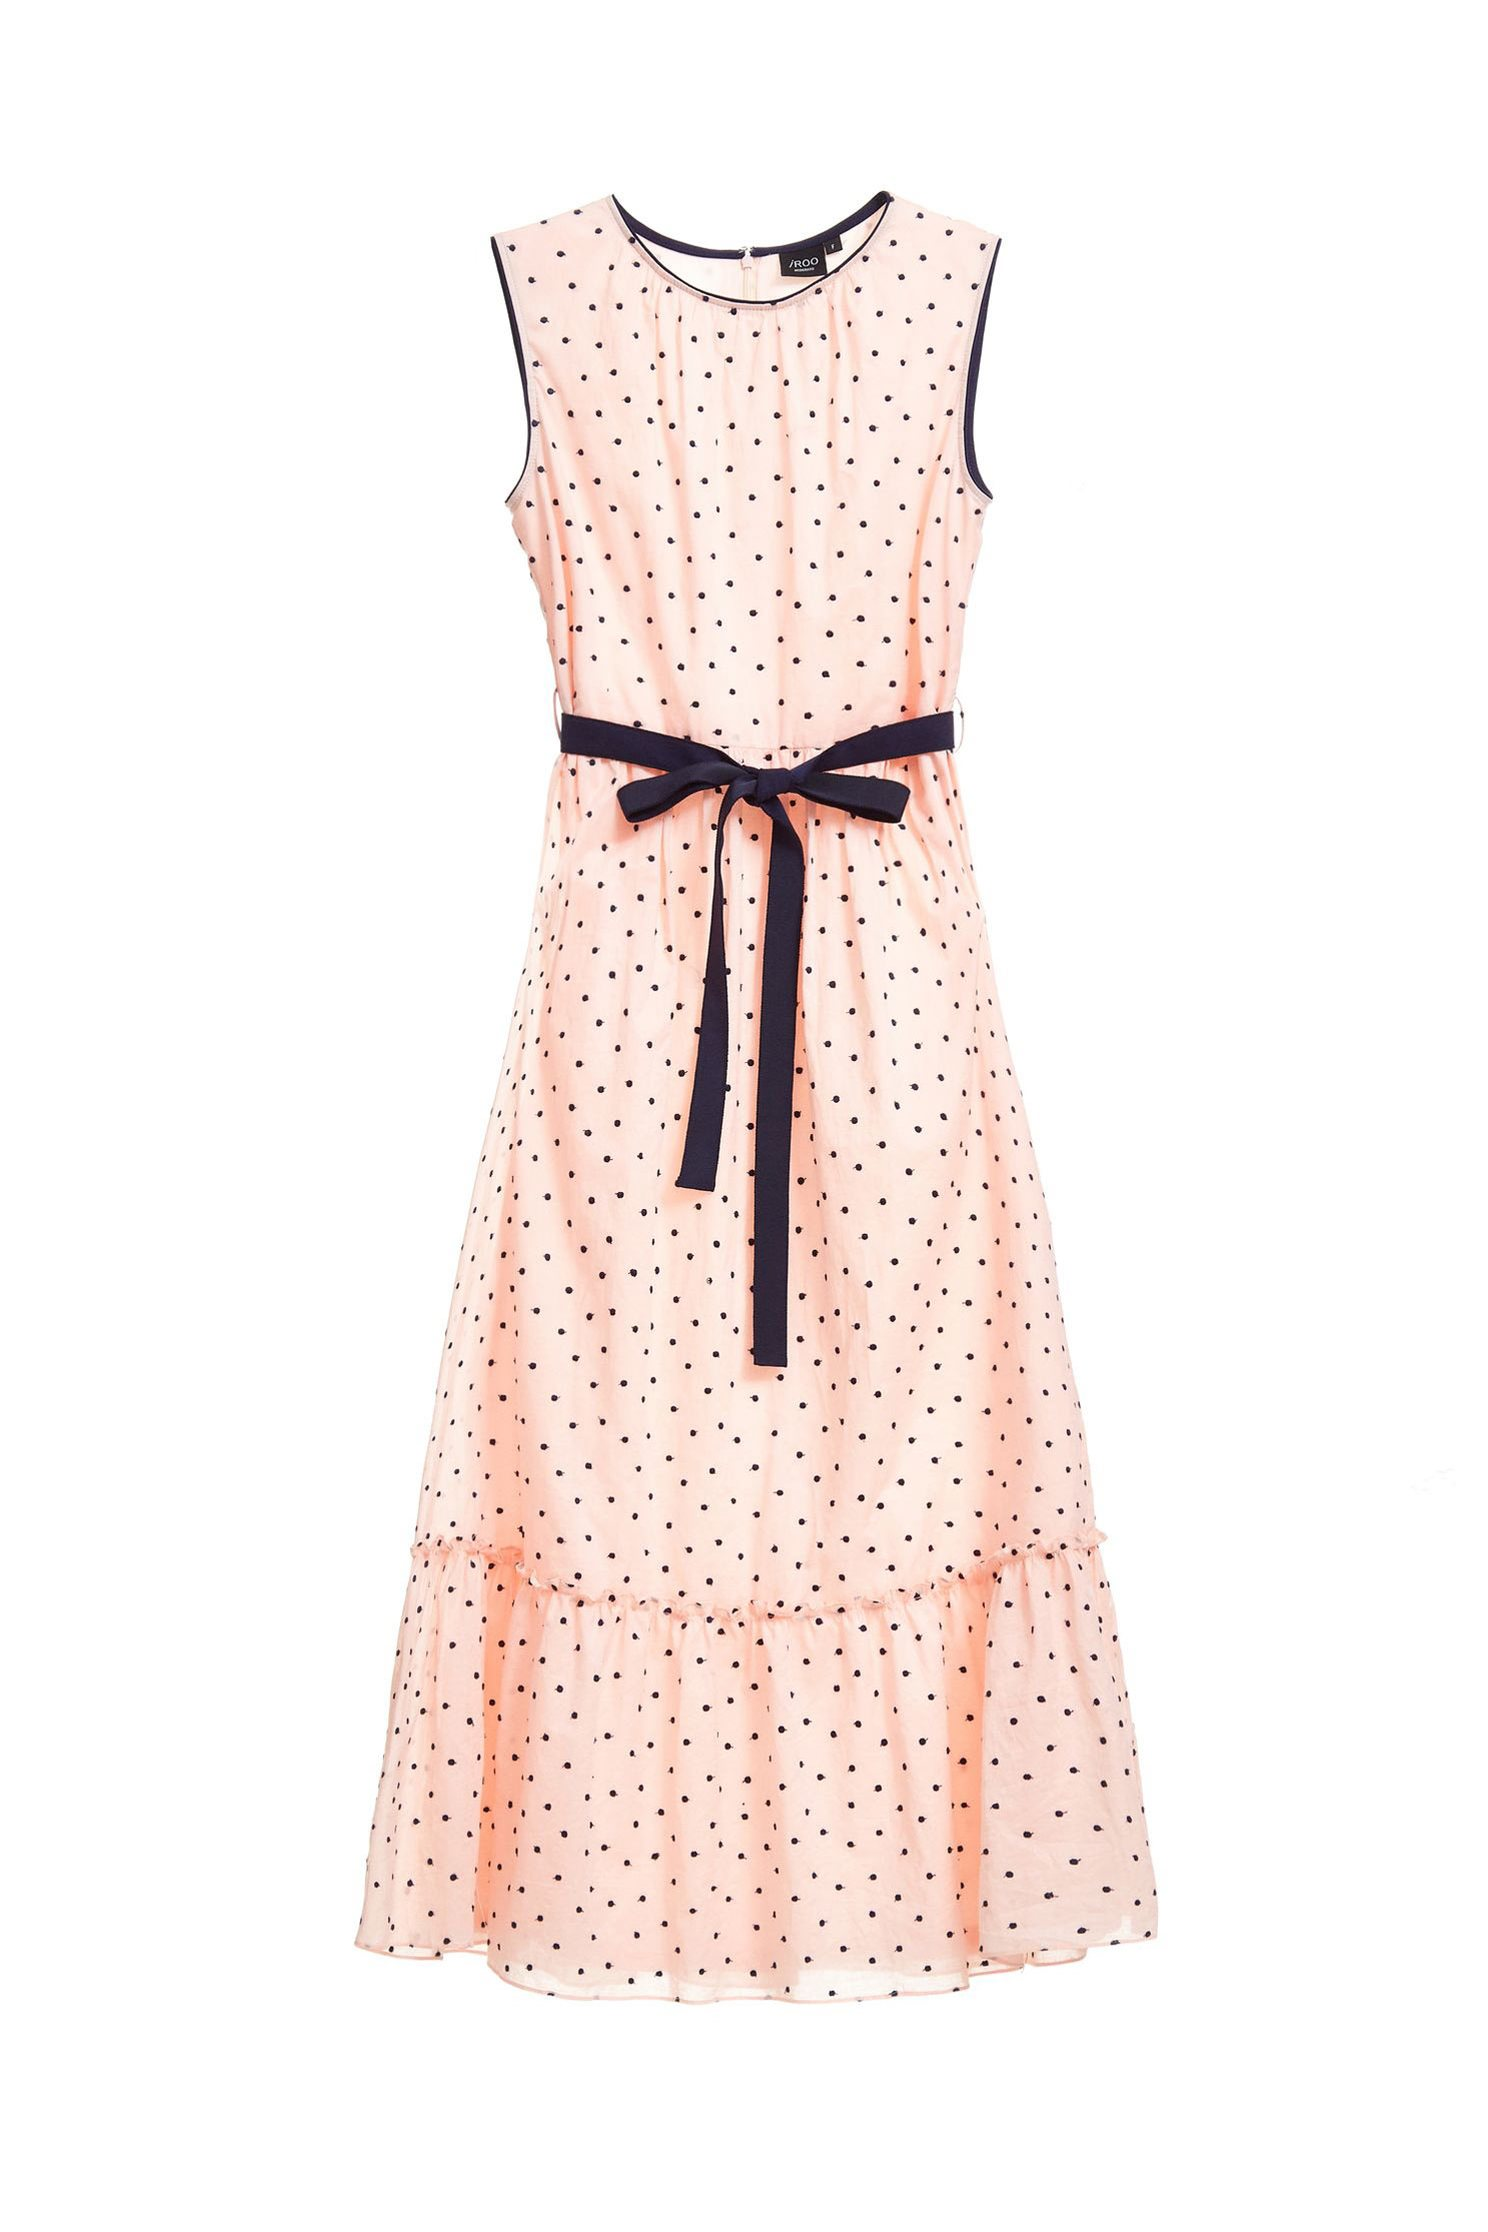 Polka dot fashion dress